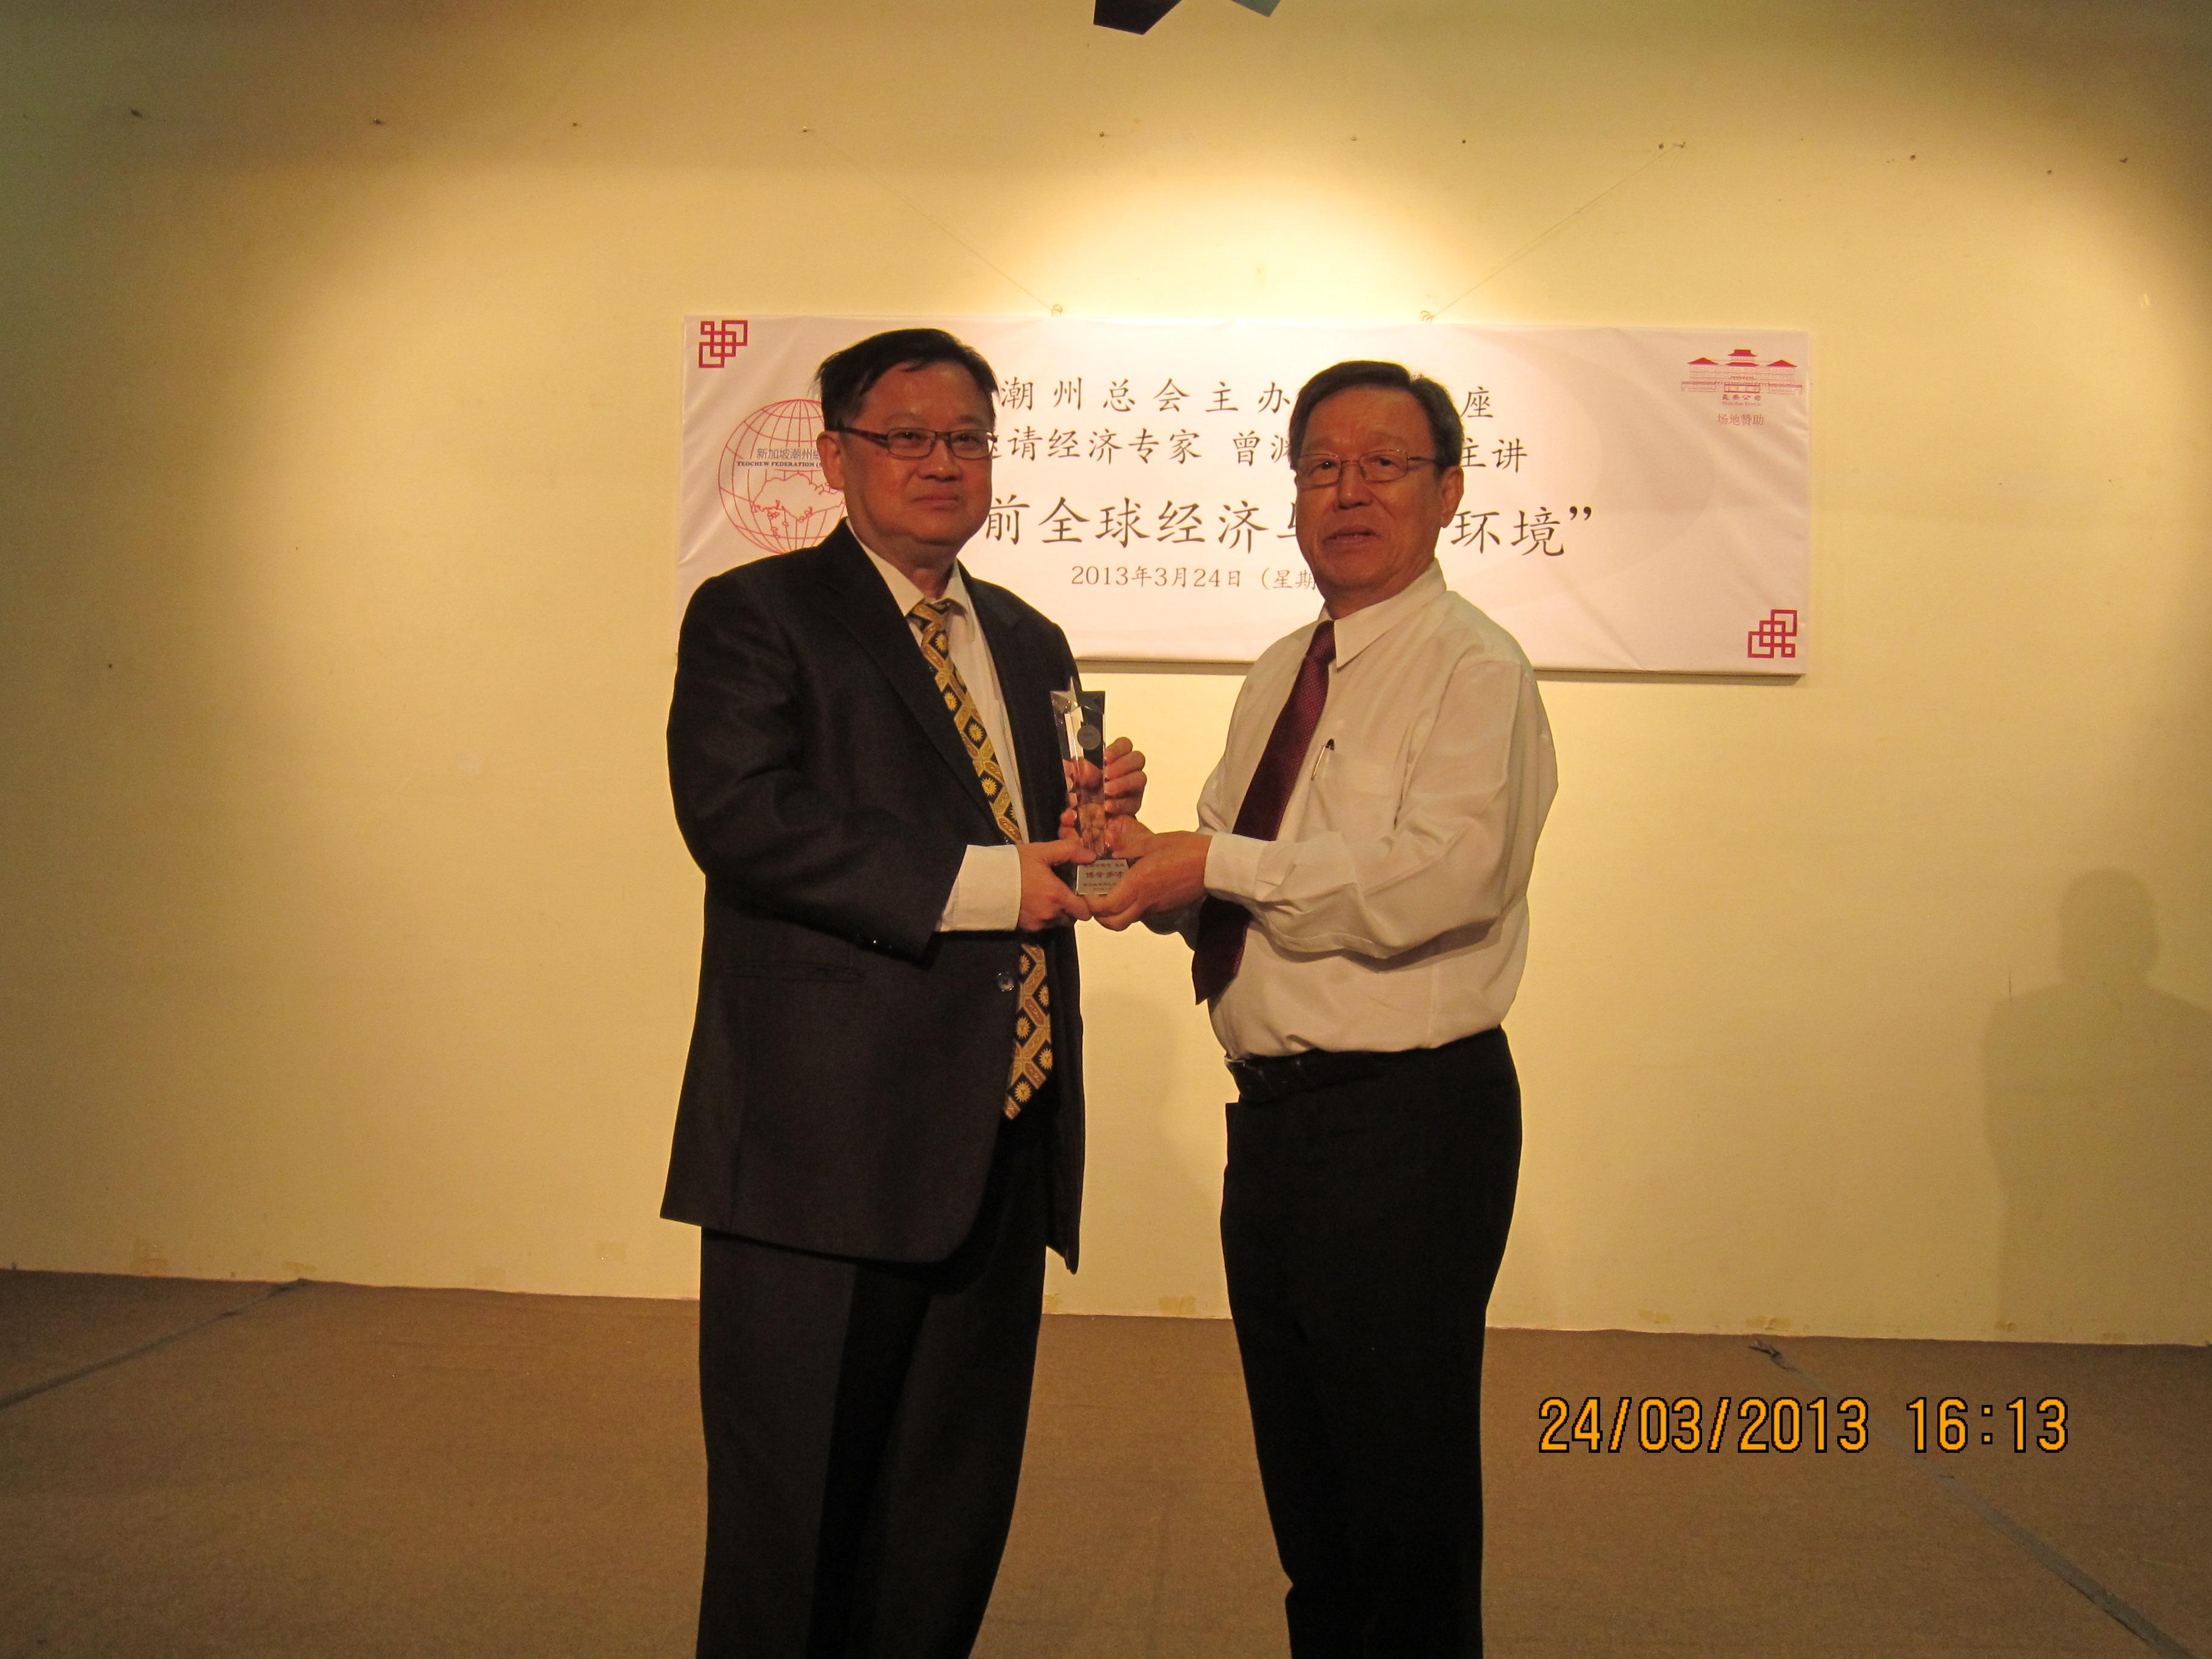 Other - 24 Mar 2013 Teochew Federation (Singapore) (105)